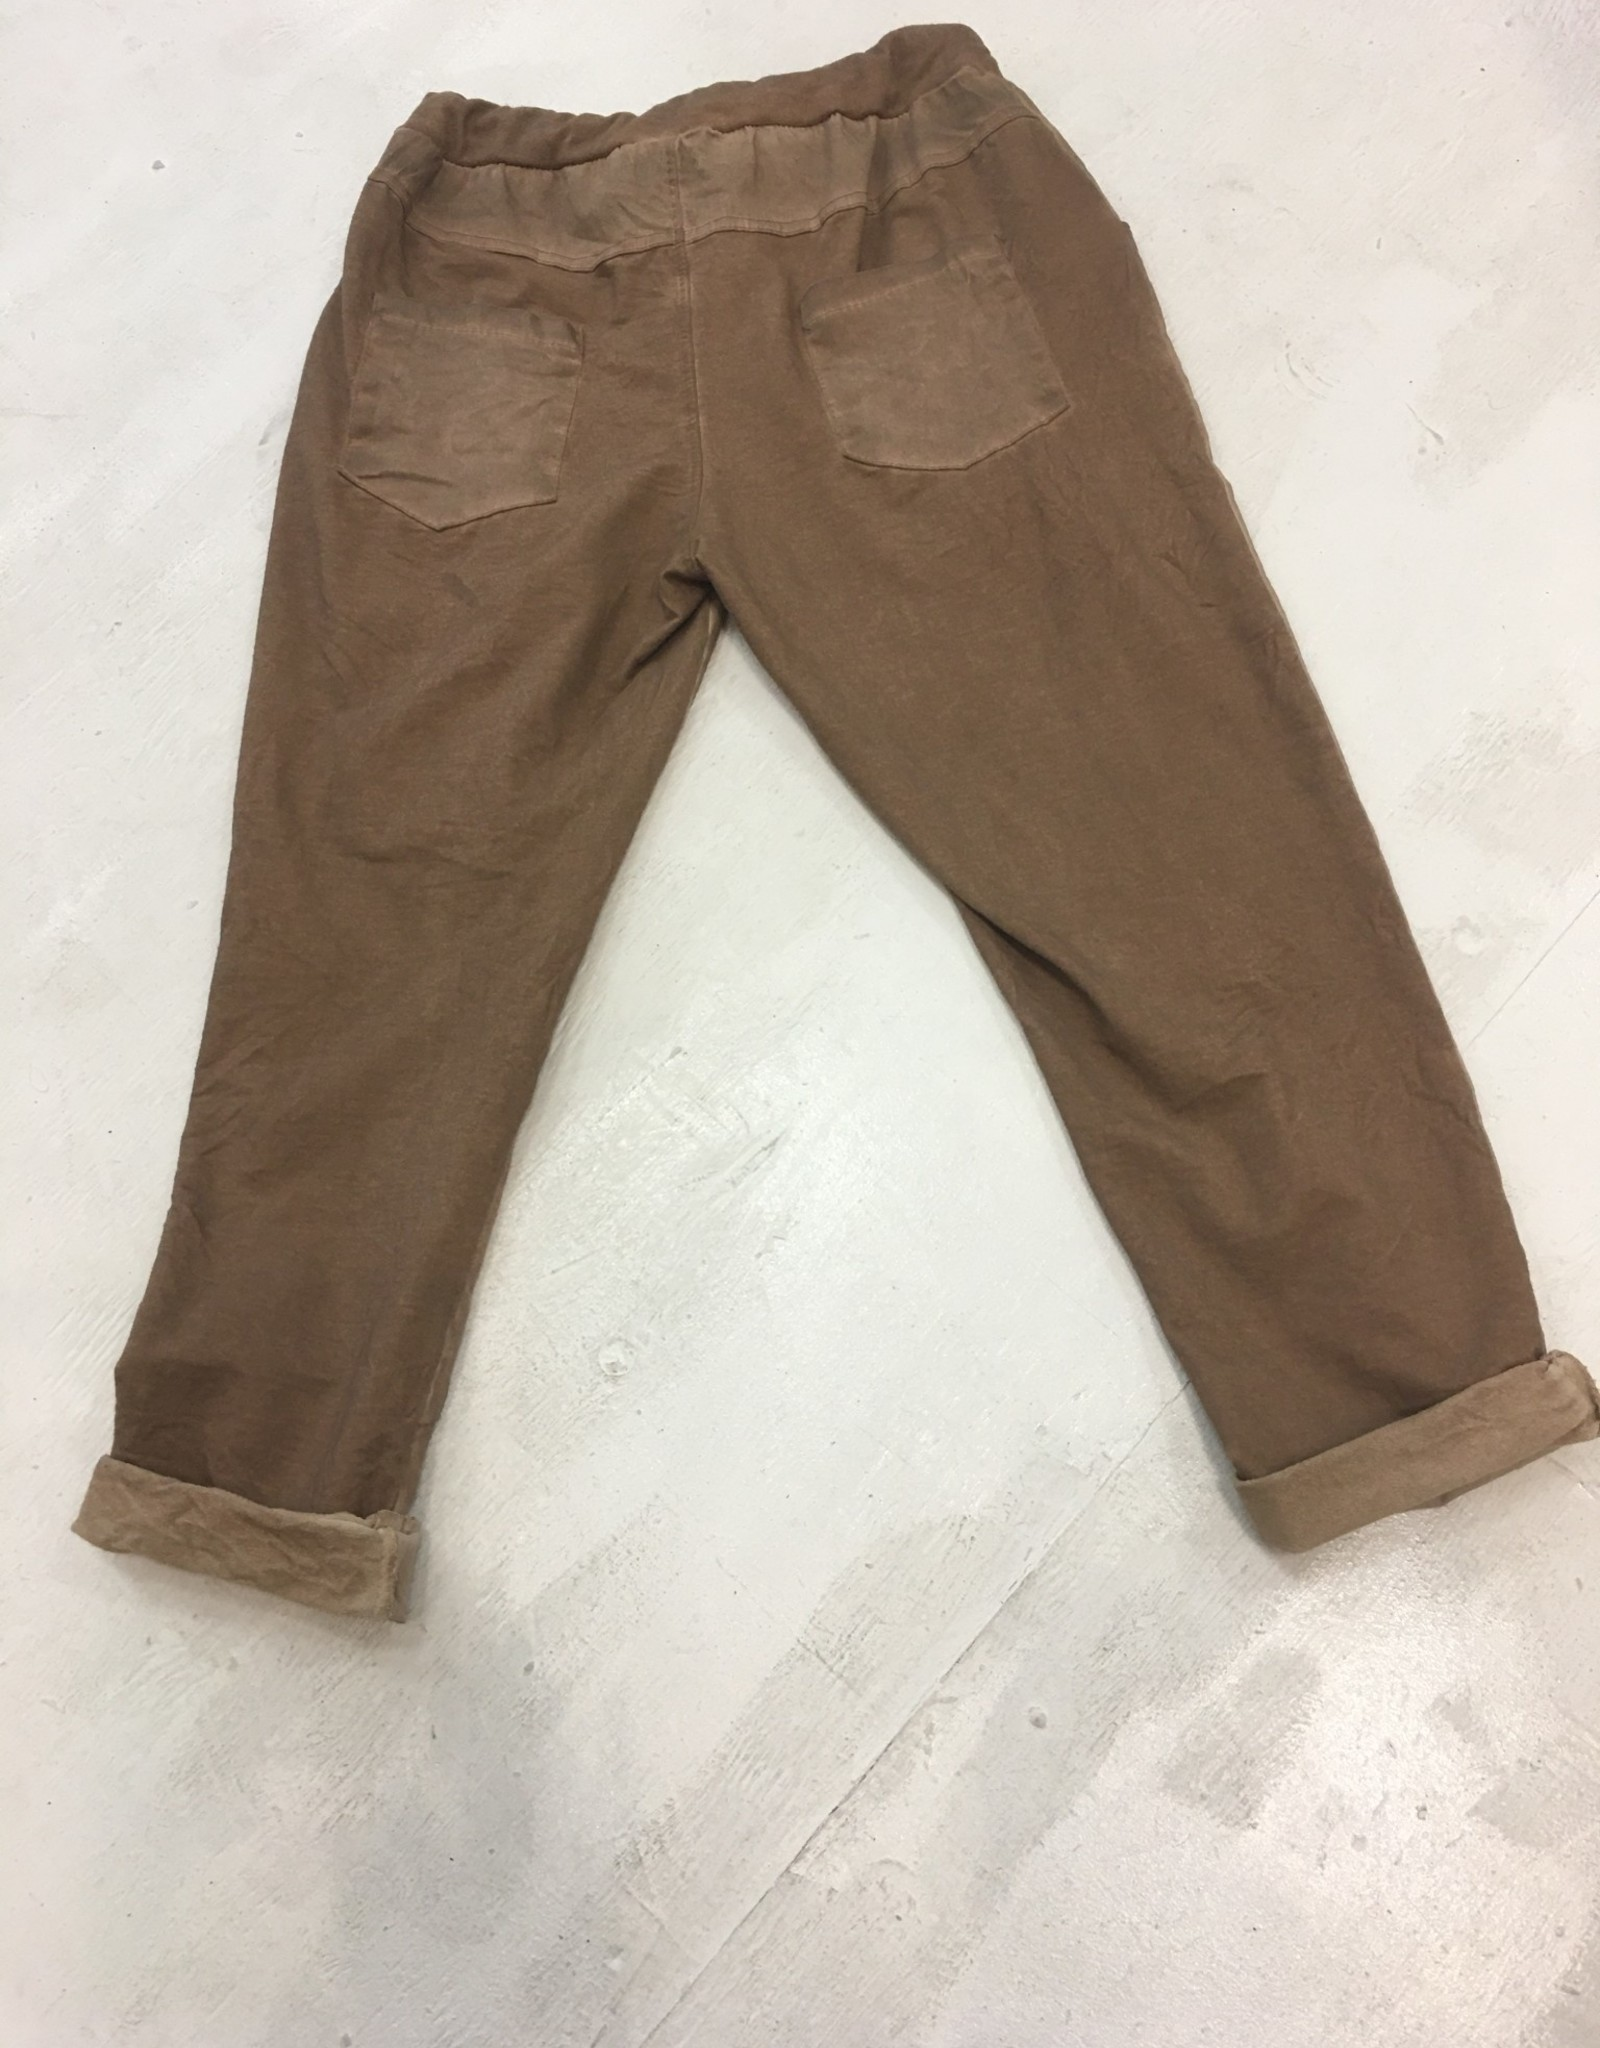 Bella Amore  1127 jeans